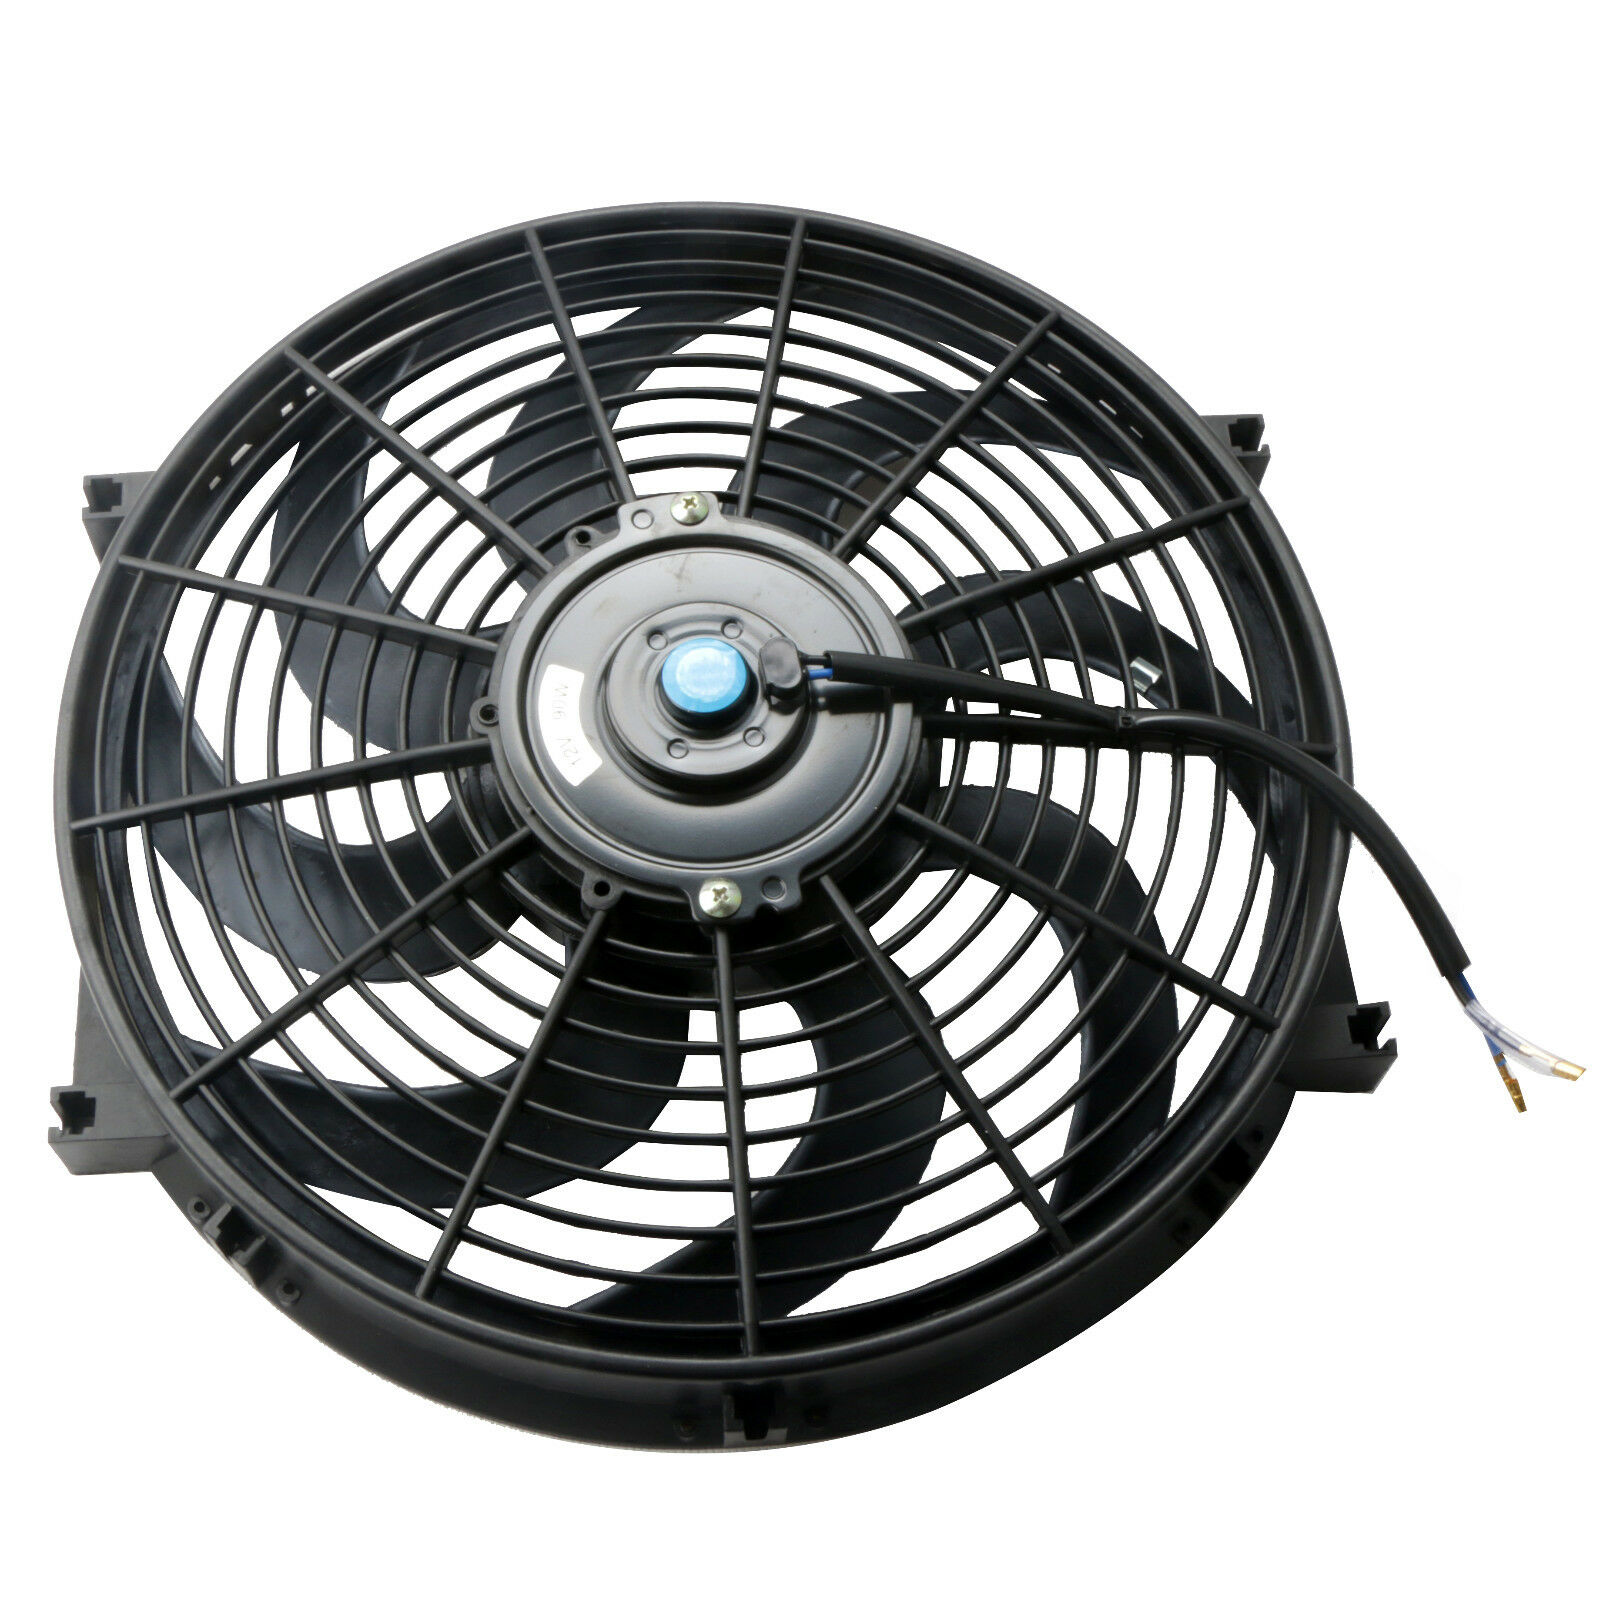 2 Pcs 10 inch Electric Radiator Cooling Fan /&Mount Kit Universal Slim Push Pull